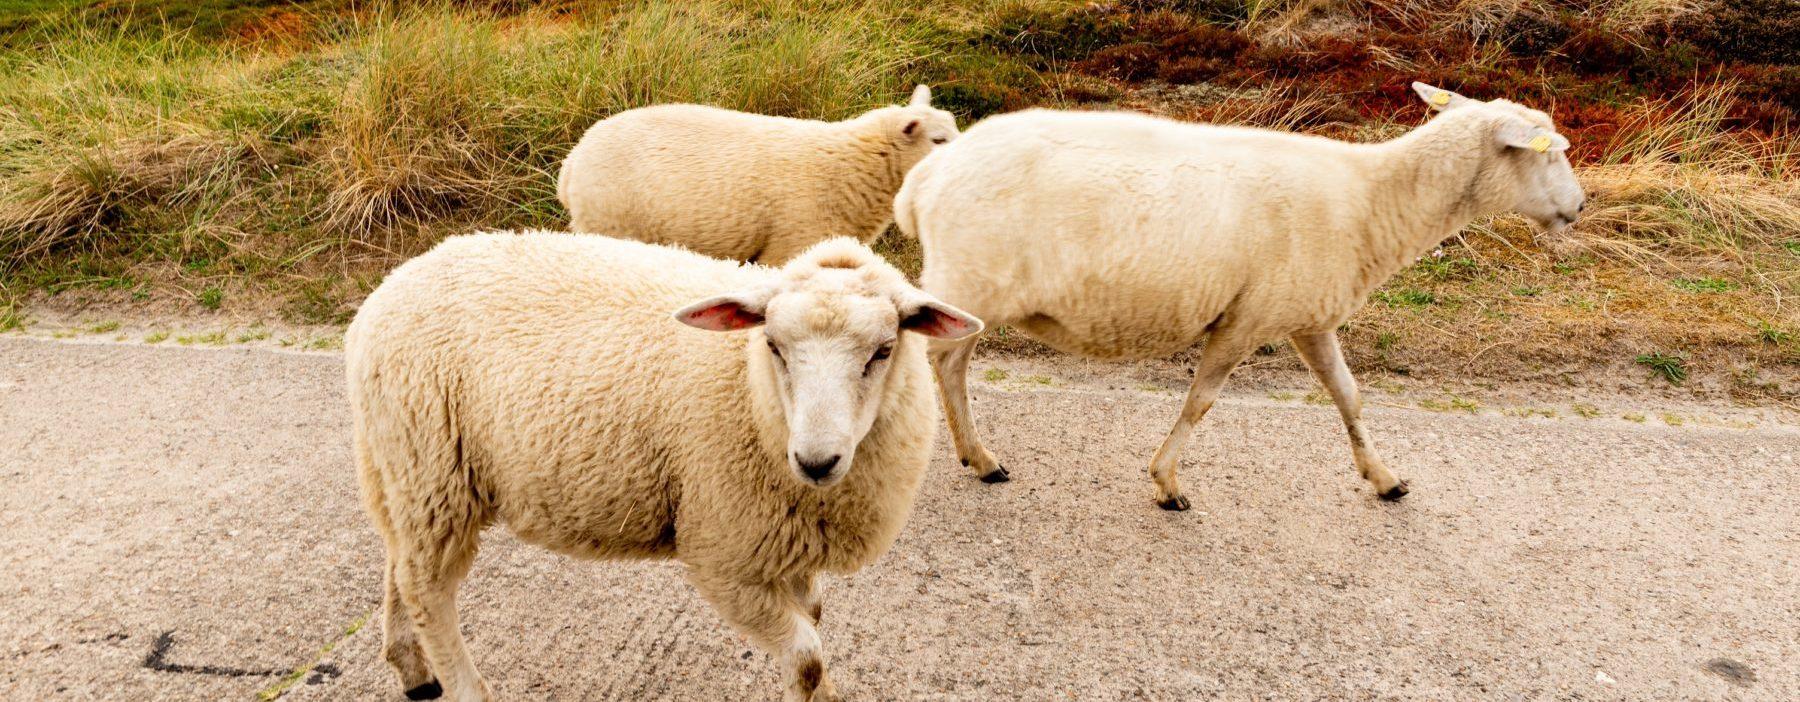 Schafe Insel Sylt Dhm 2233